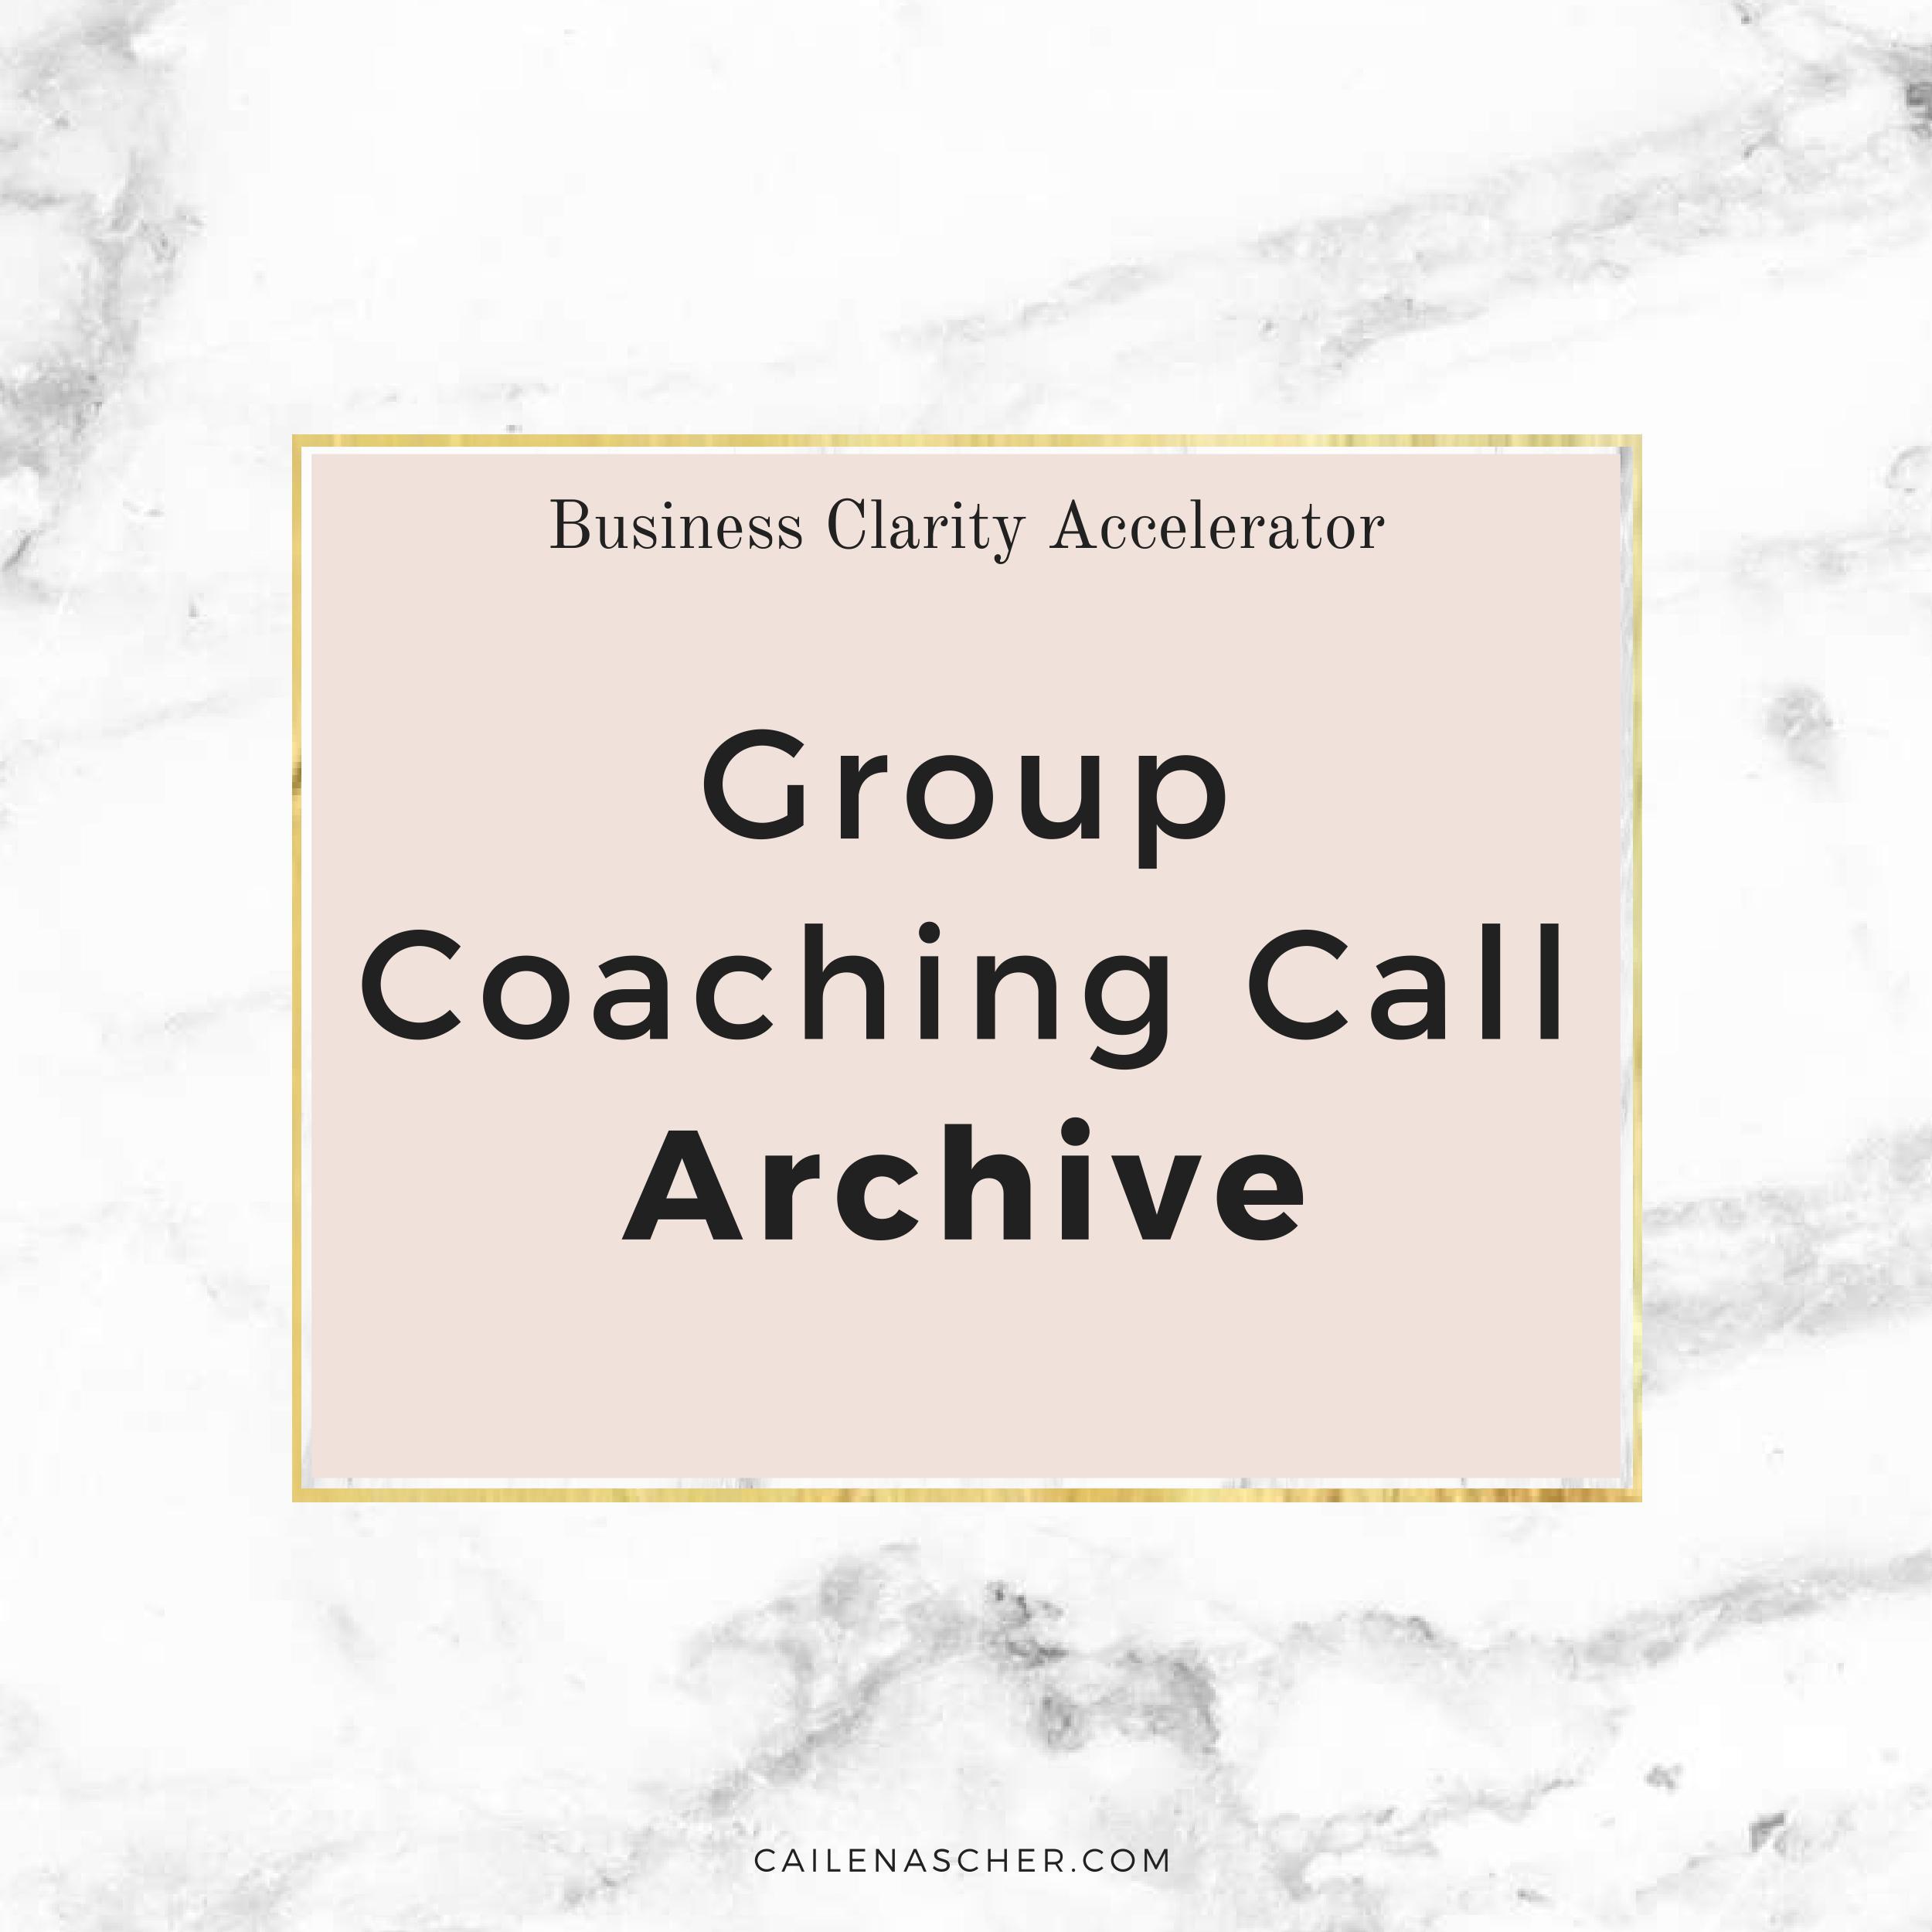 BCA - Bonus - Group Coaching Call Archive.jpg